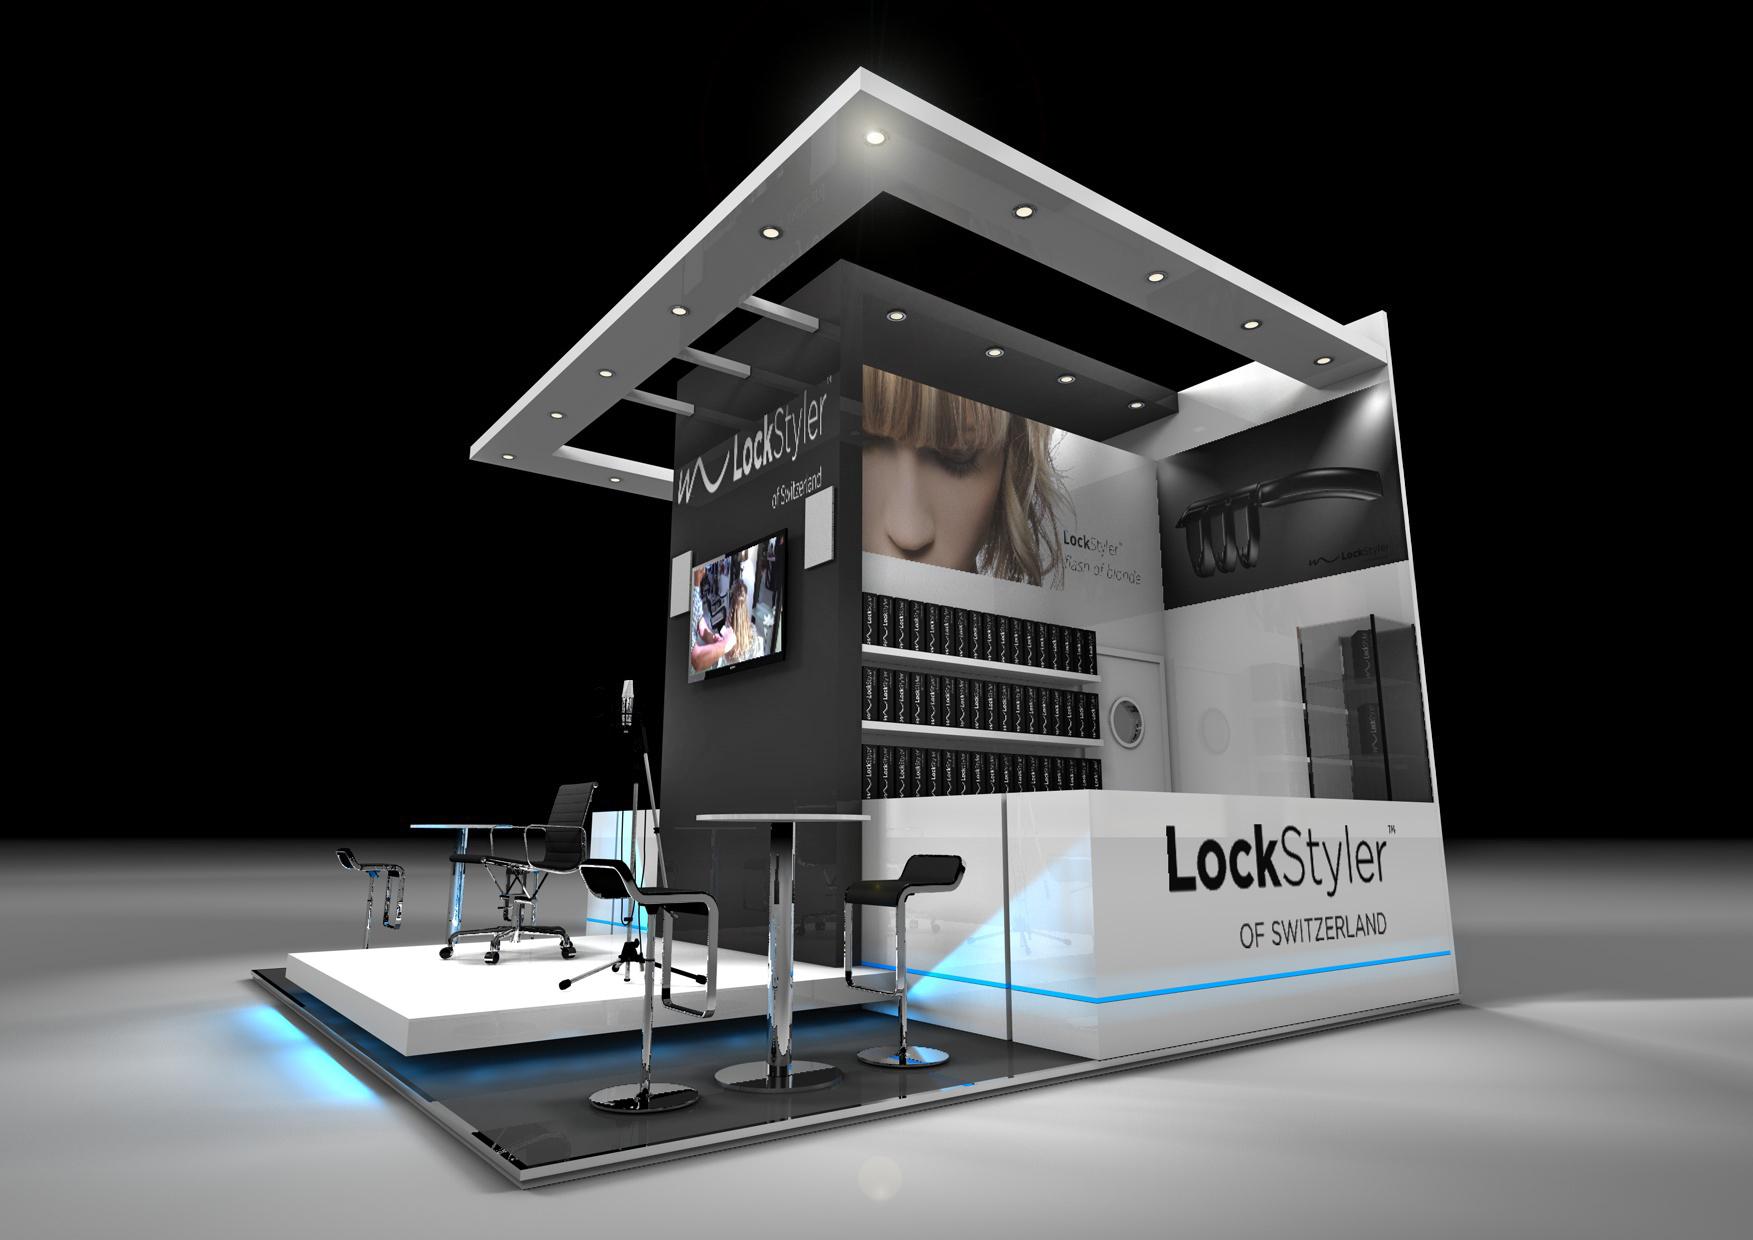 lockstyler 9m x 5m